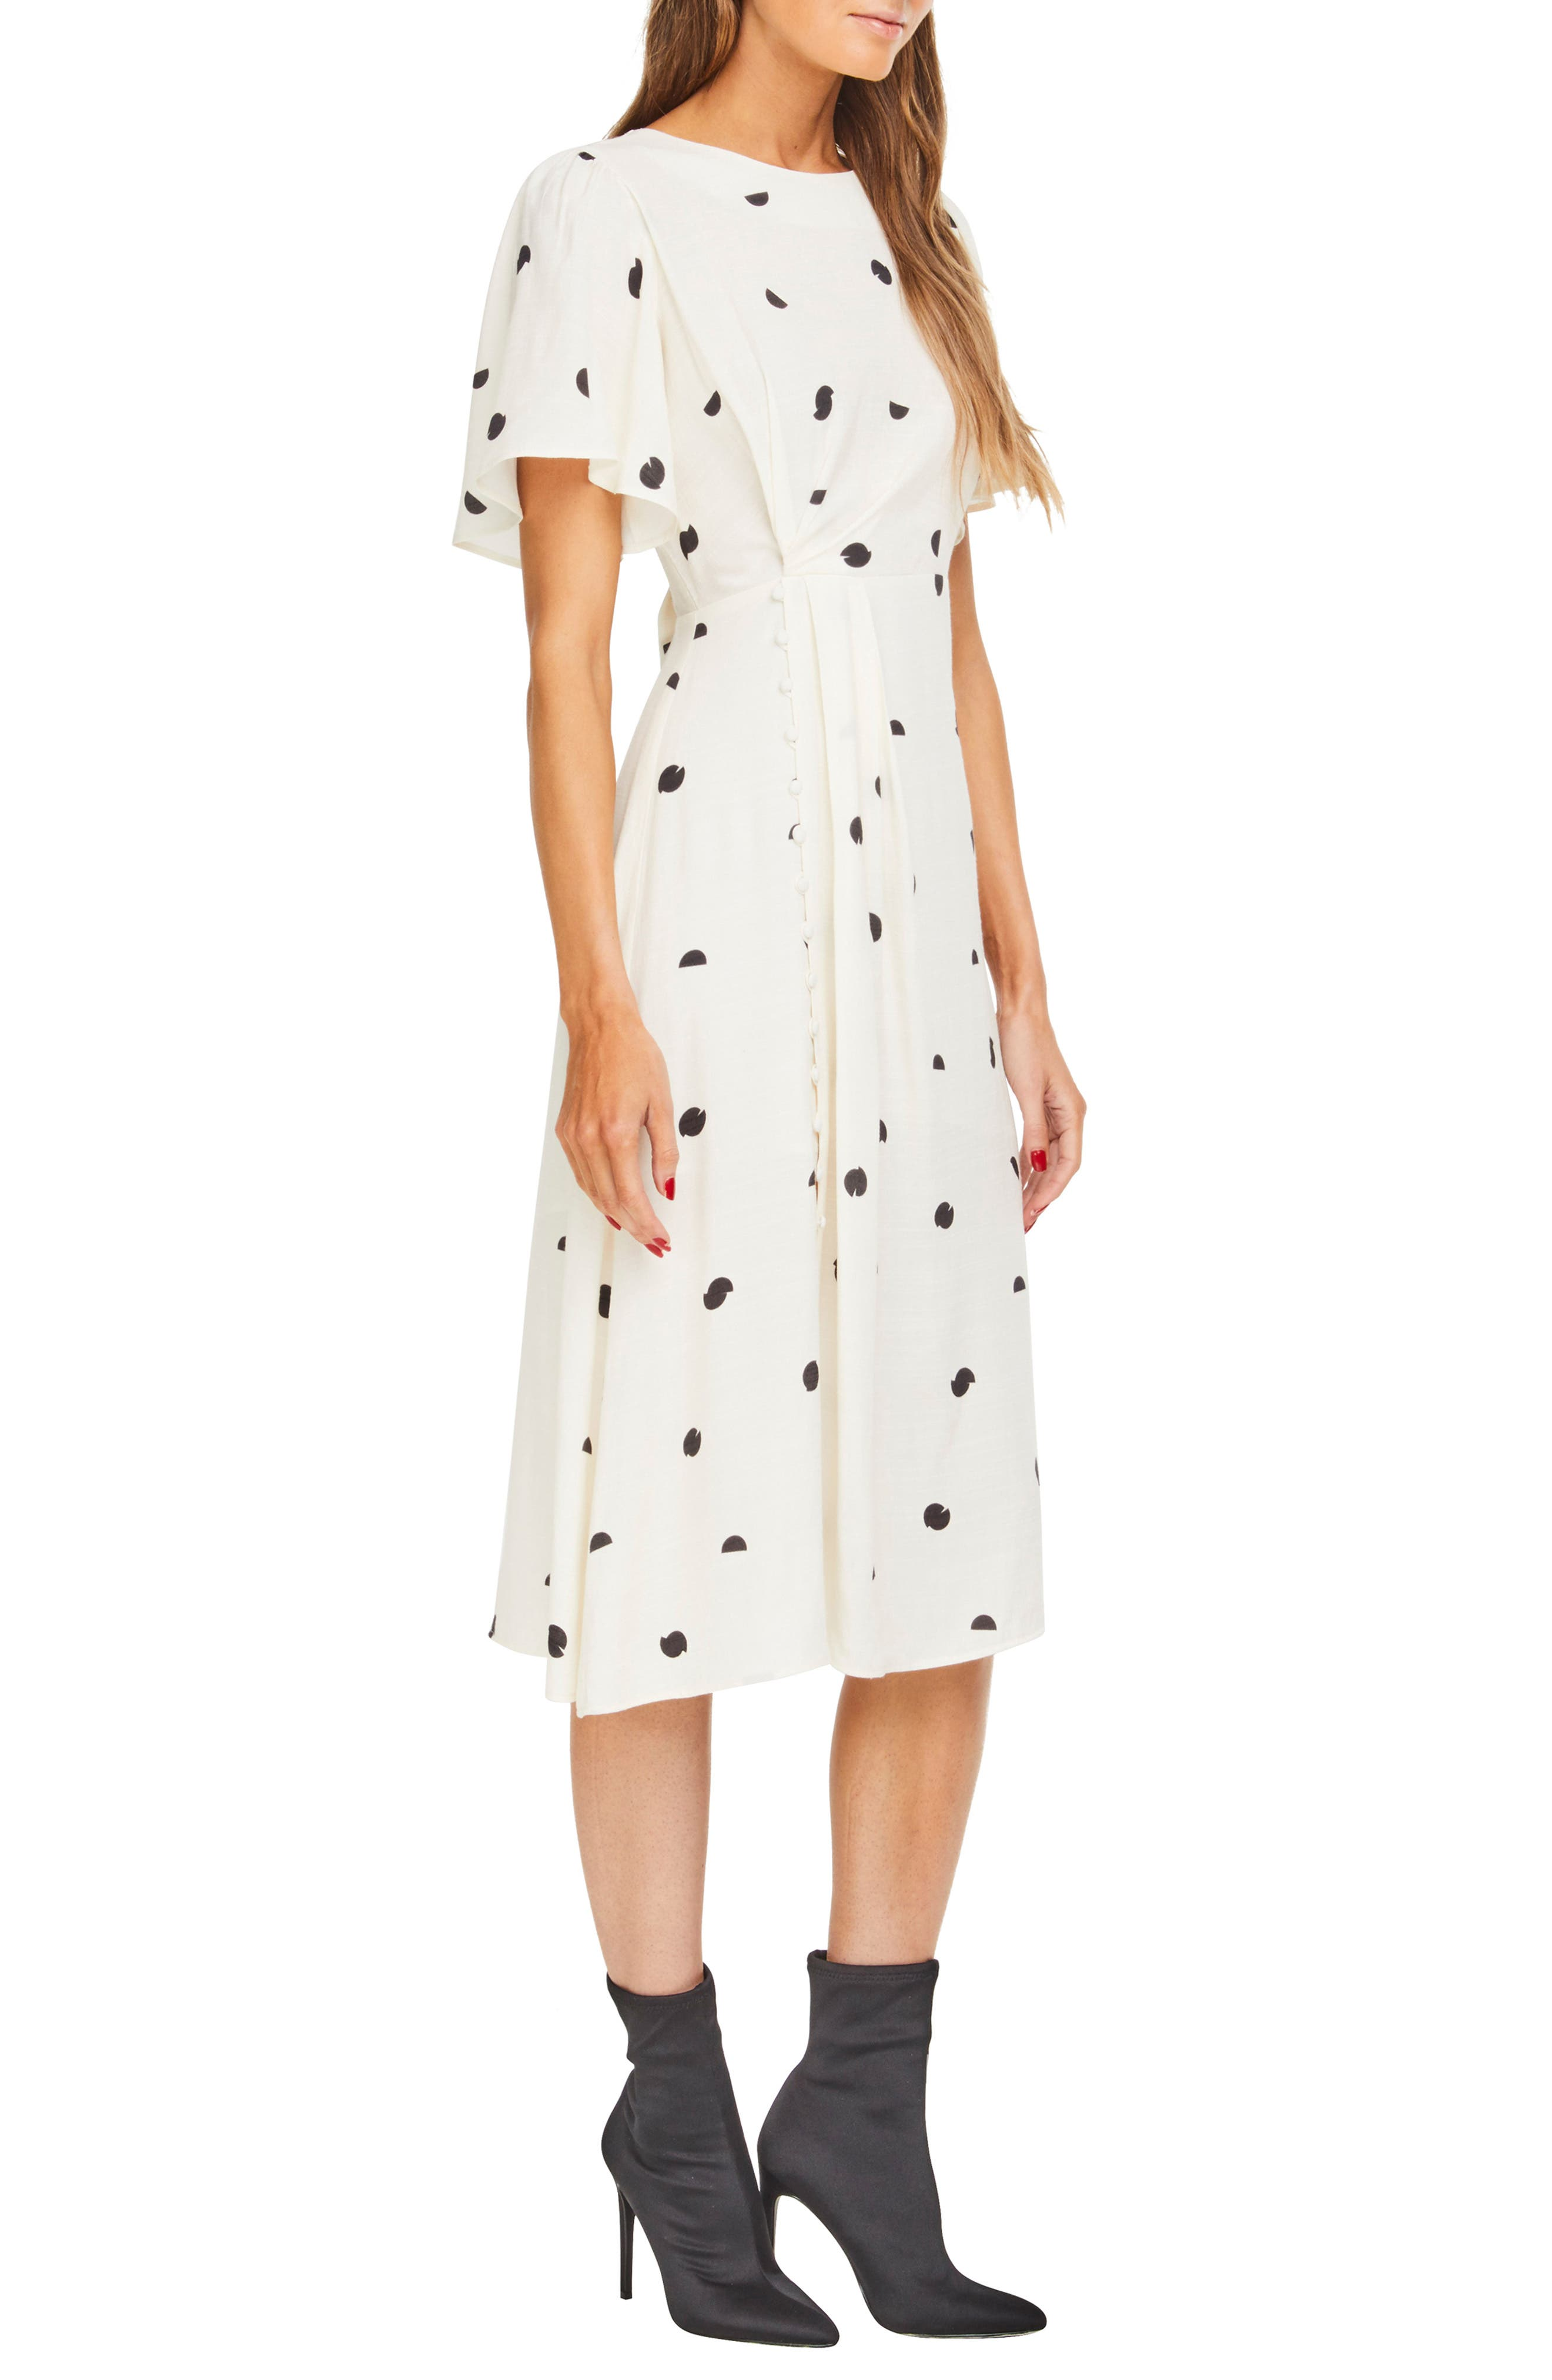 ASTR THE LABEL,                             Ebony Dress,                             Alternate thumbnail 3, color,                             900